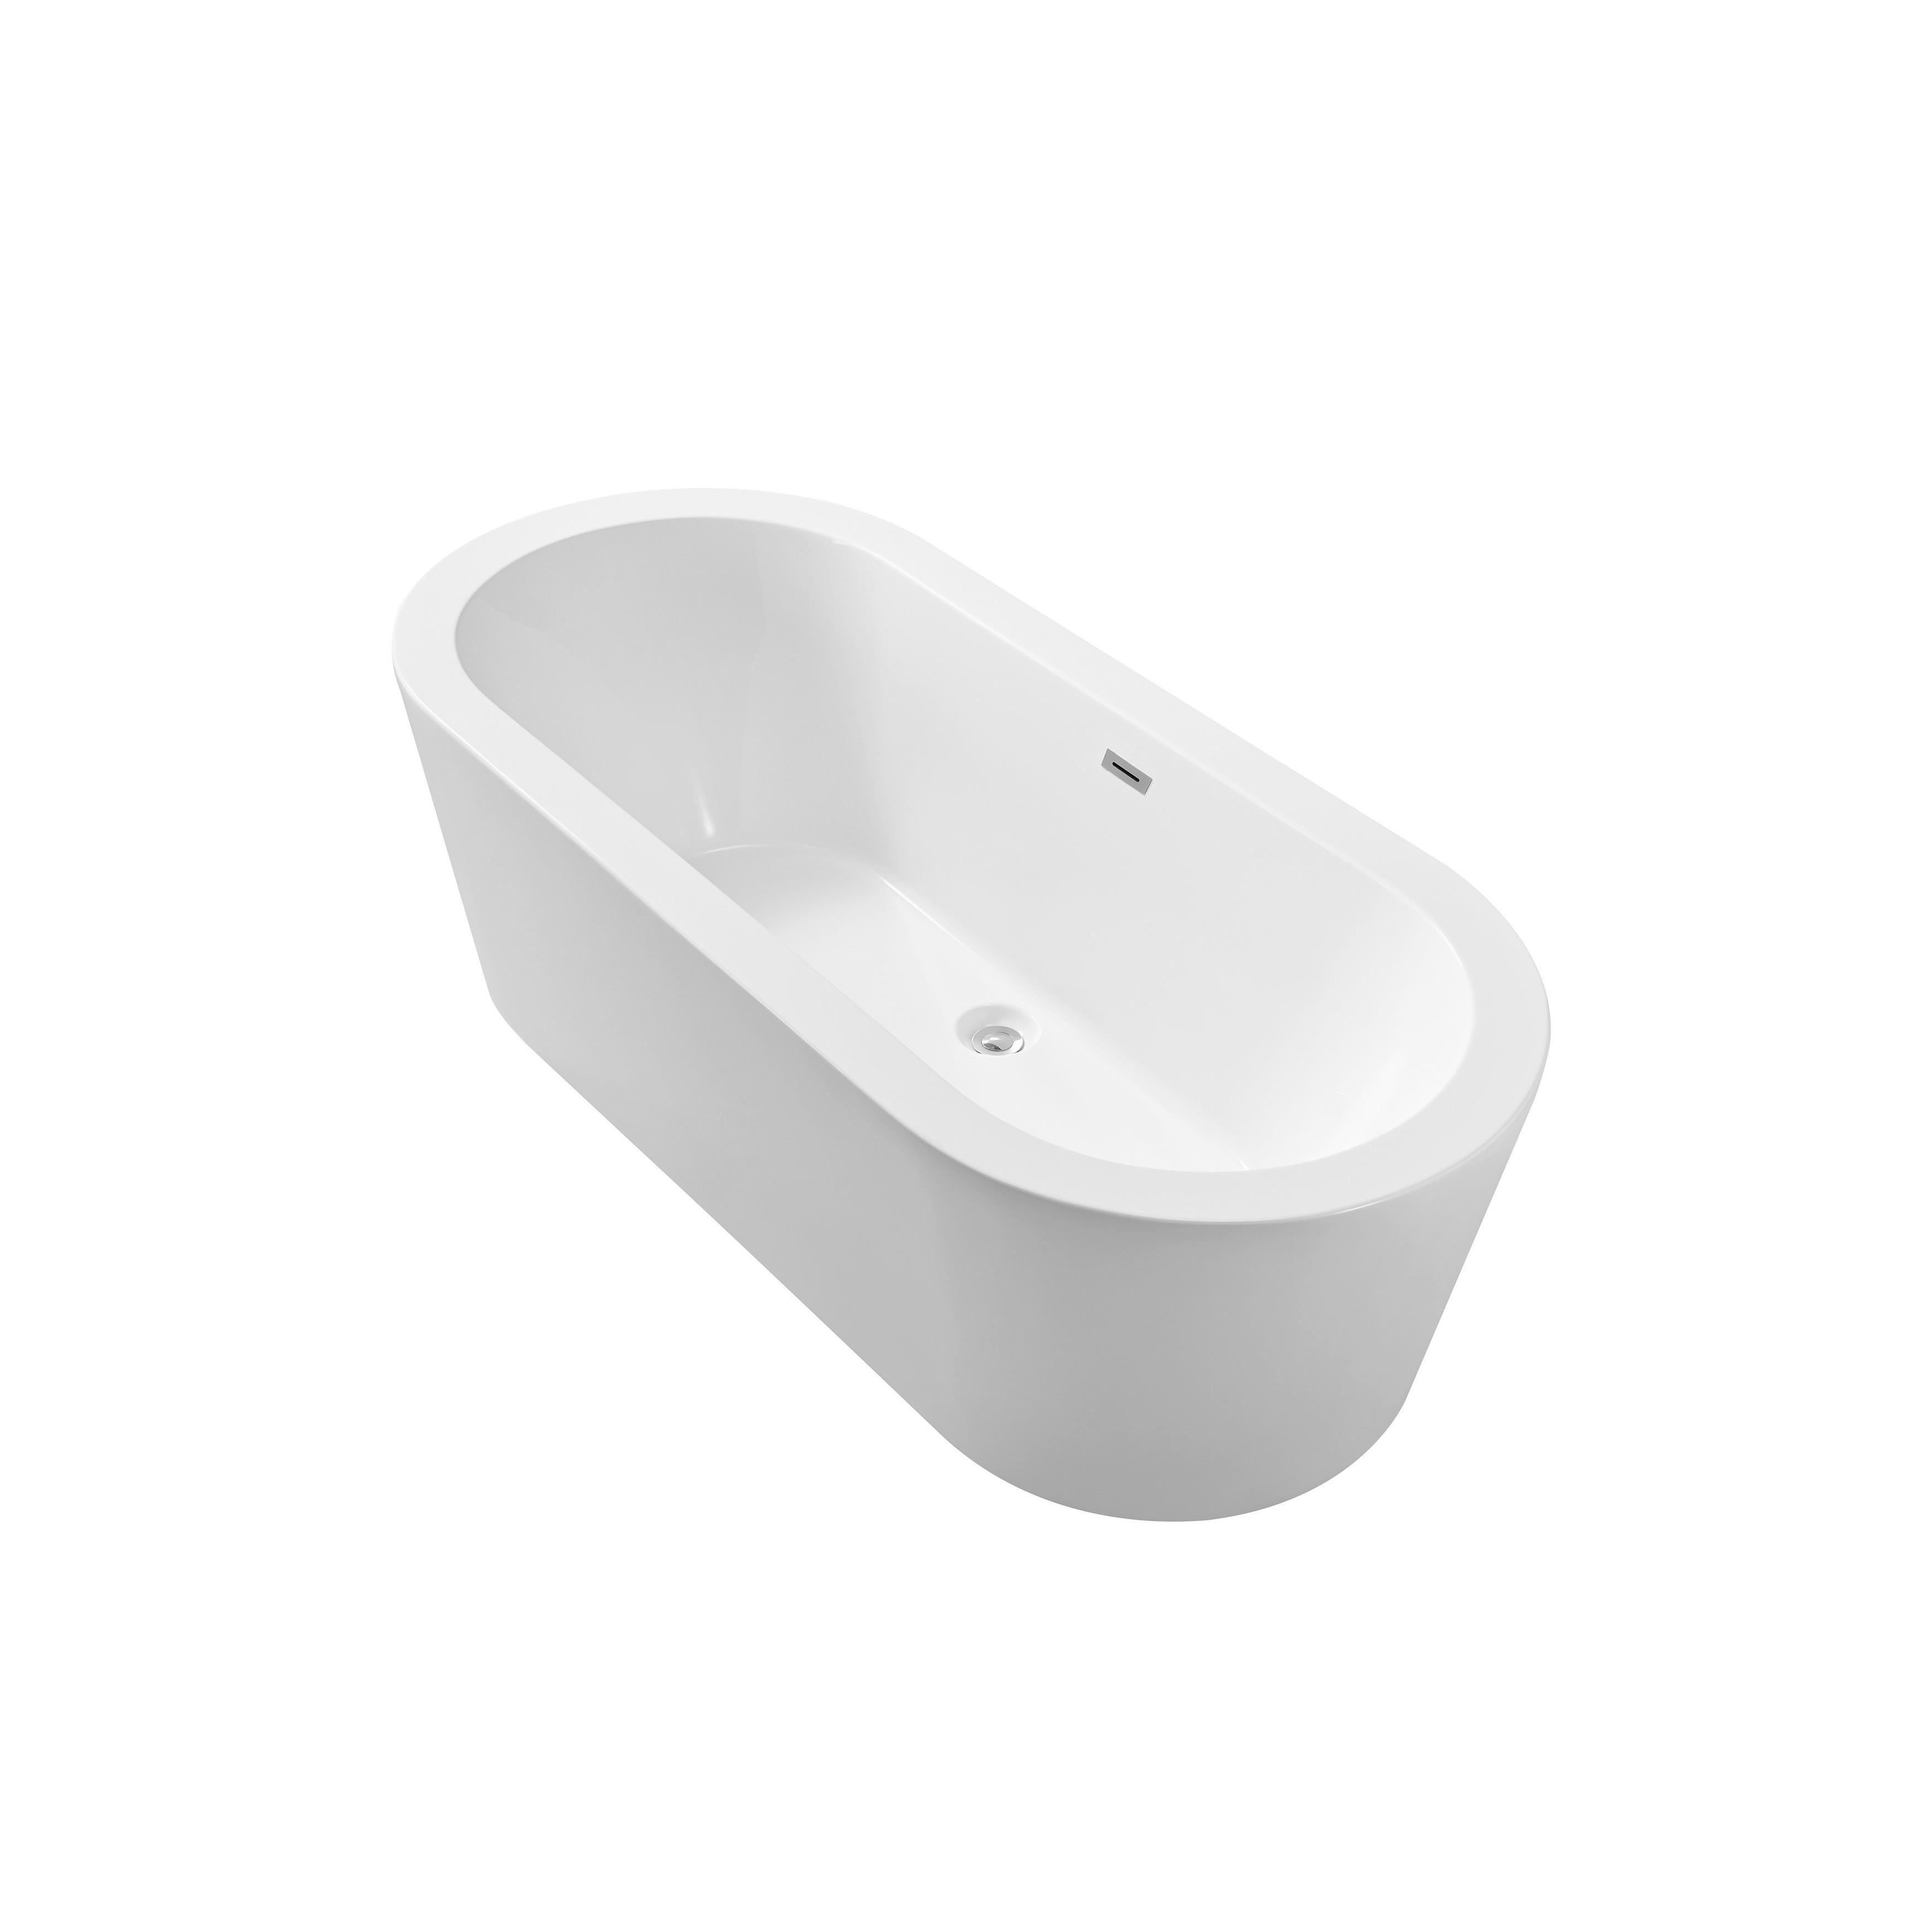 high holiday for bathtub bathtubs en bath rooms hansedom bad double hotel wellness wyndham mit res stralsund room doppelzimmer